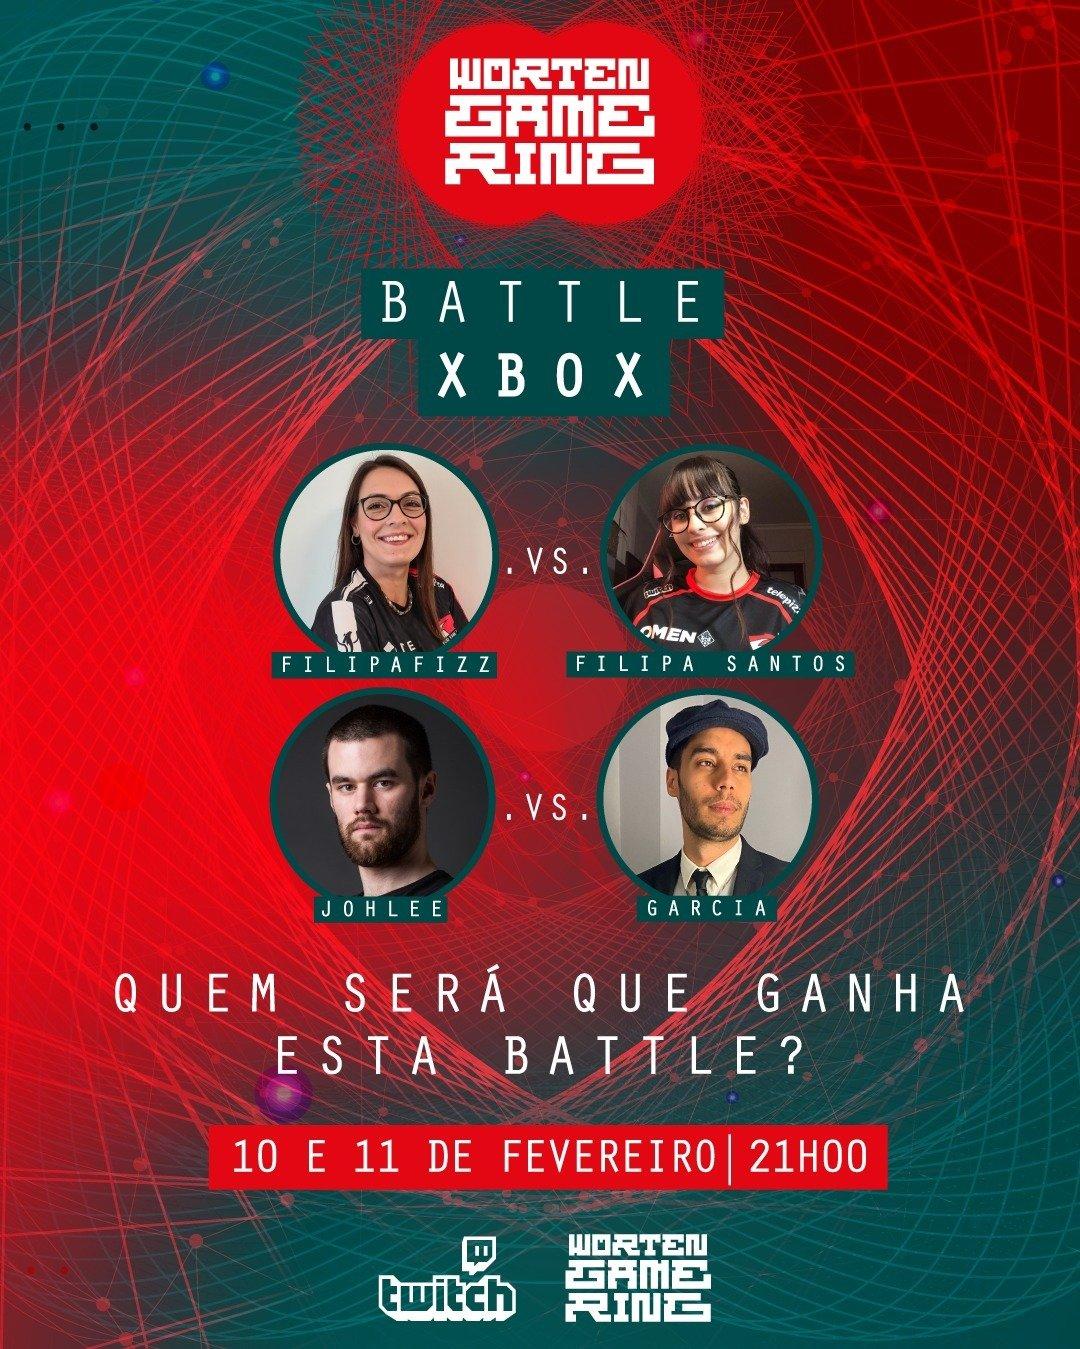 WORTEN GAME RING PROMOVE BATTLE XBOX JÁ A PARTIR DE HOJE